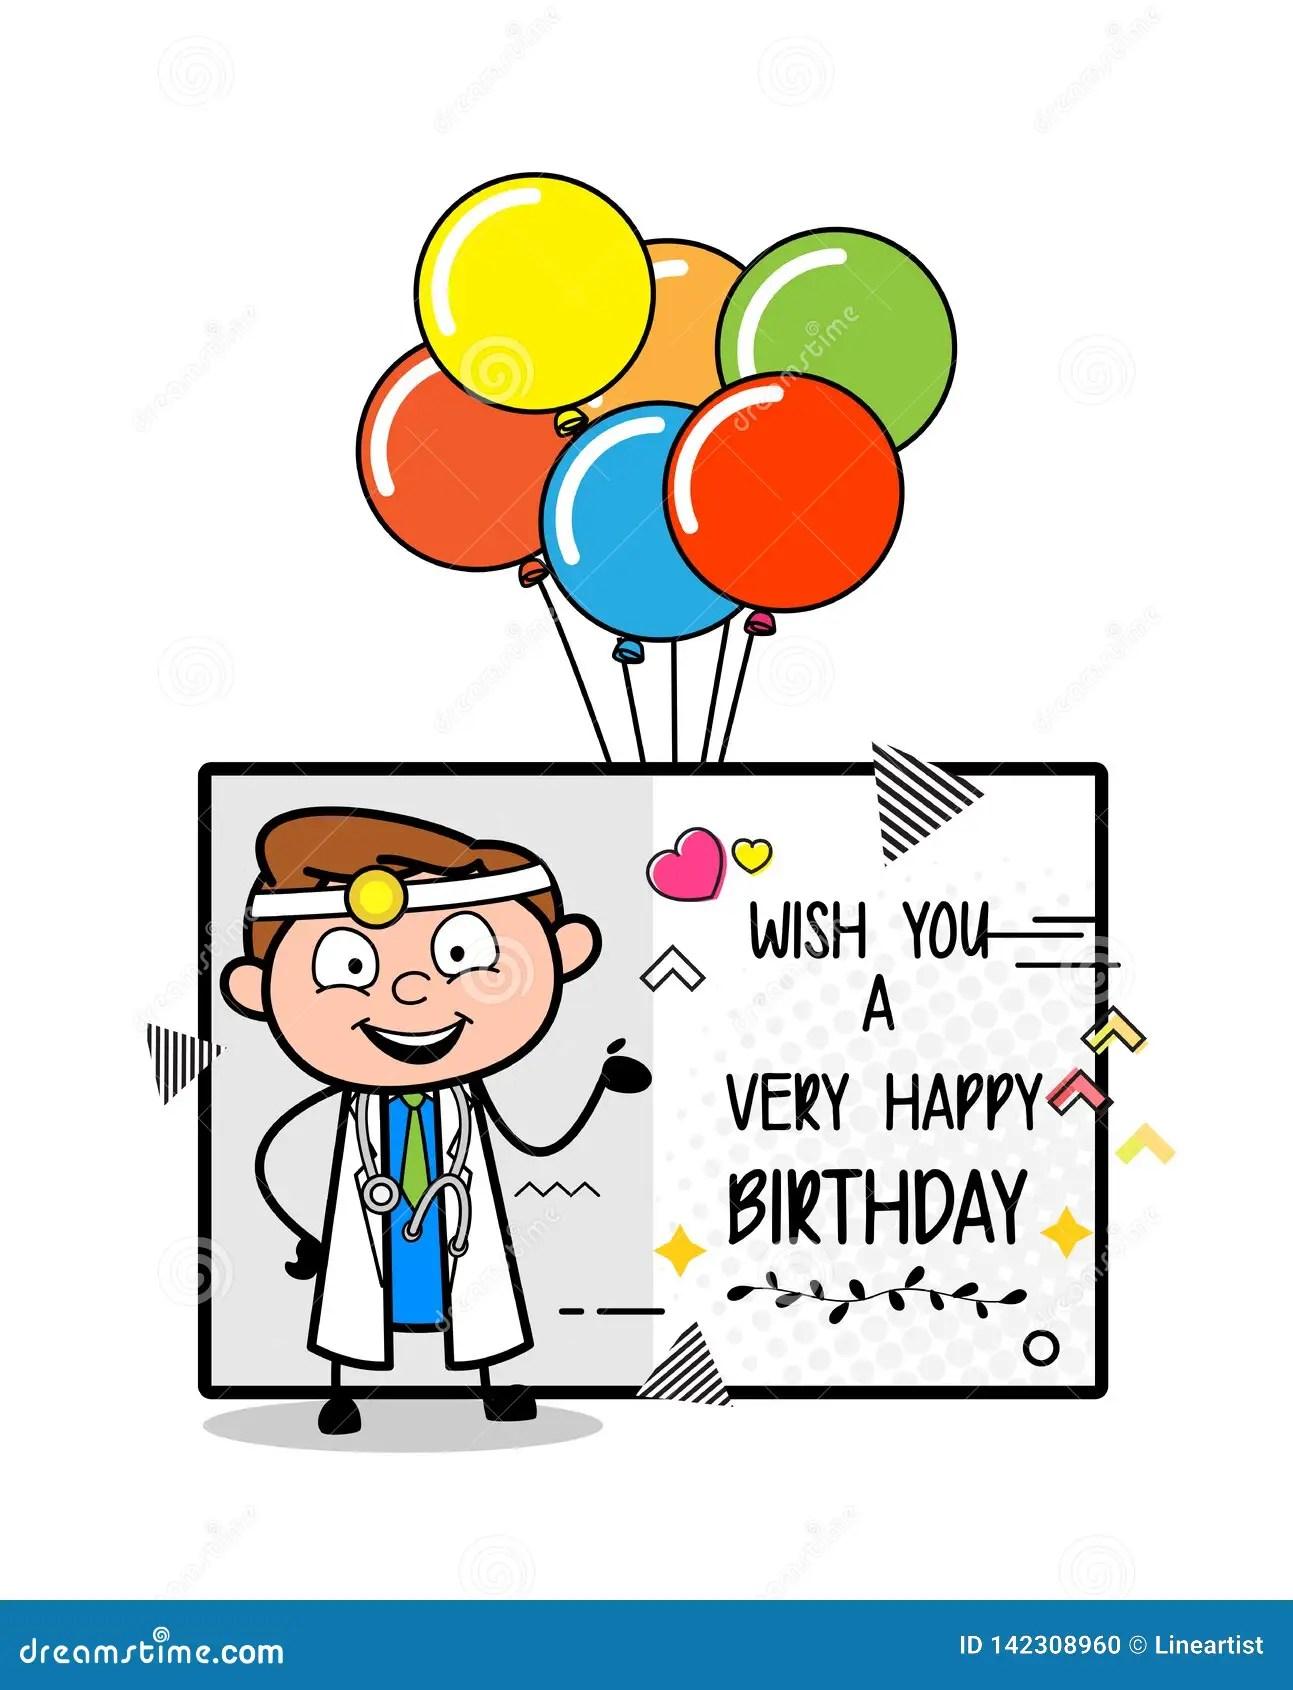 Birthday Doctor Stock Illustrations 674 Birthday Doctor Stock Illustrations Vectors Clipart Dreamstime